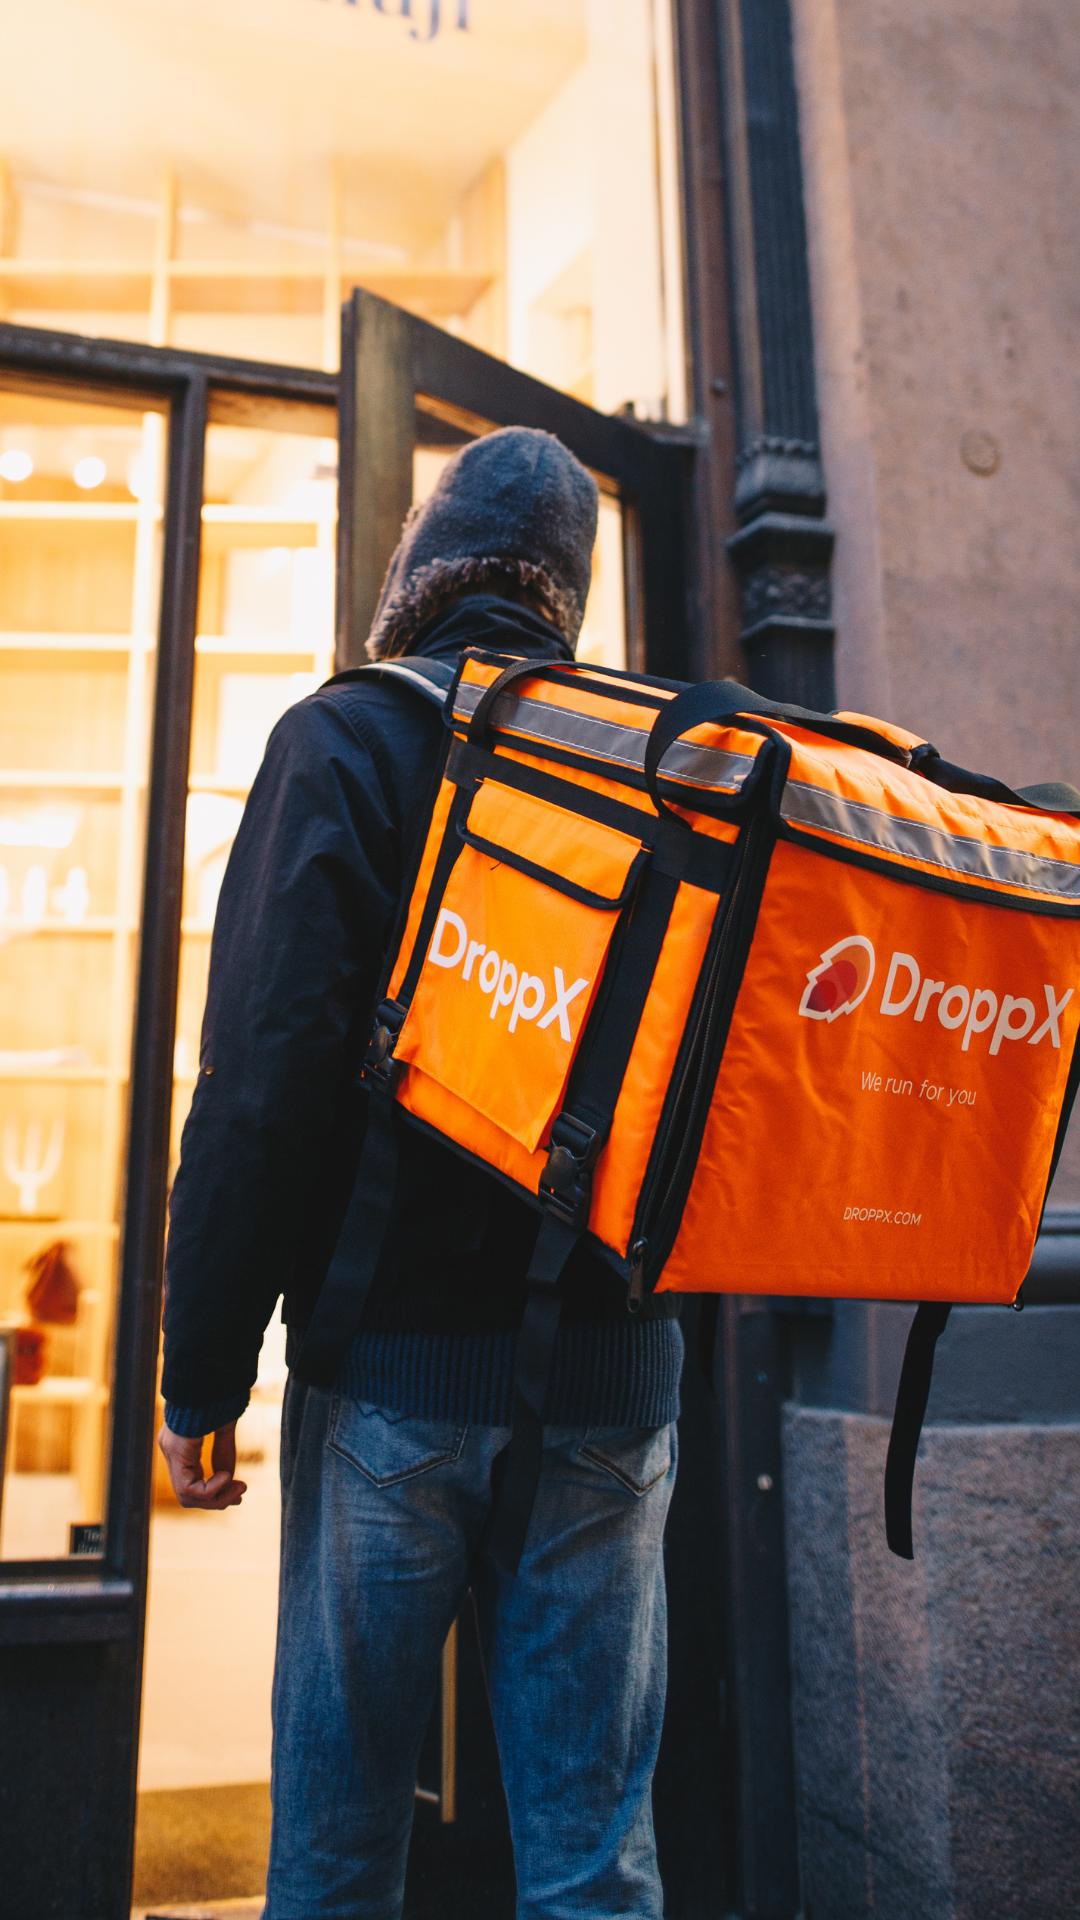 Dropper entering store